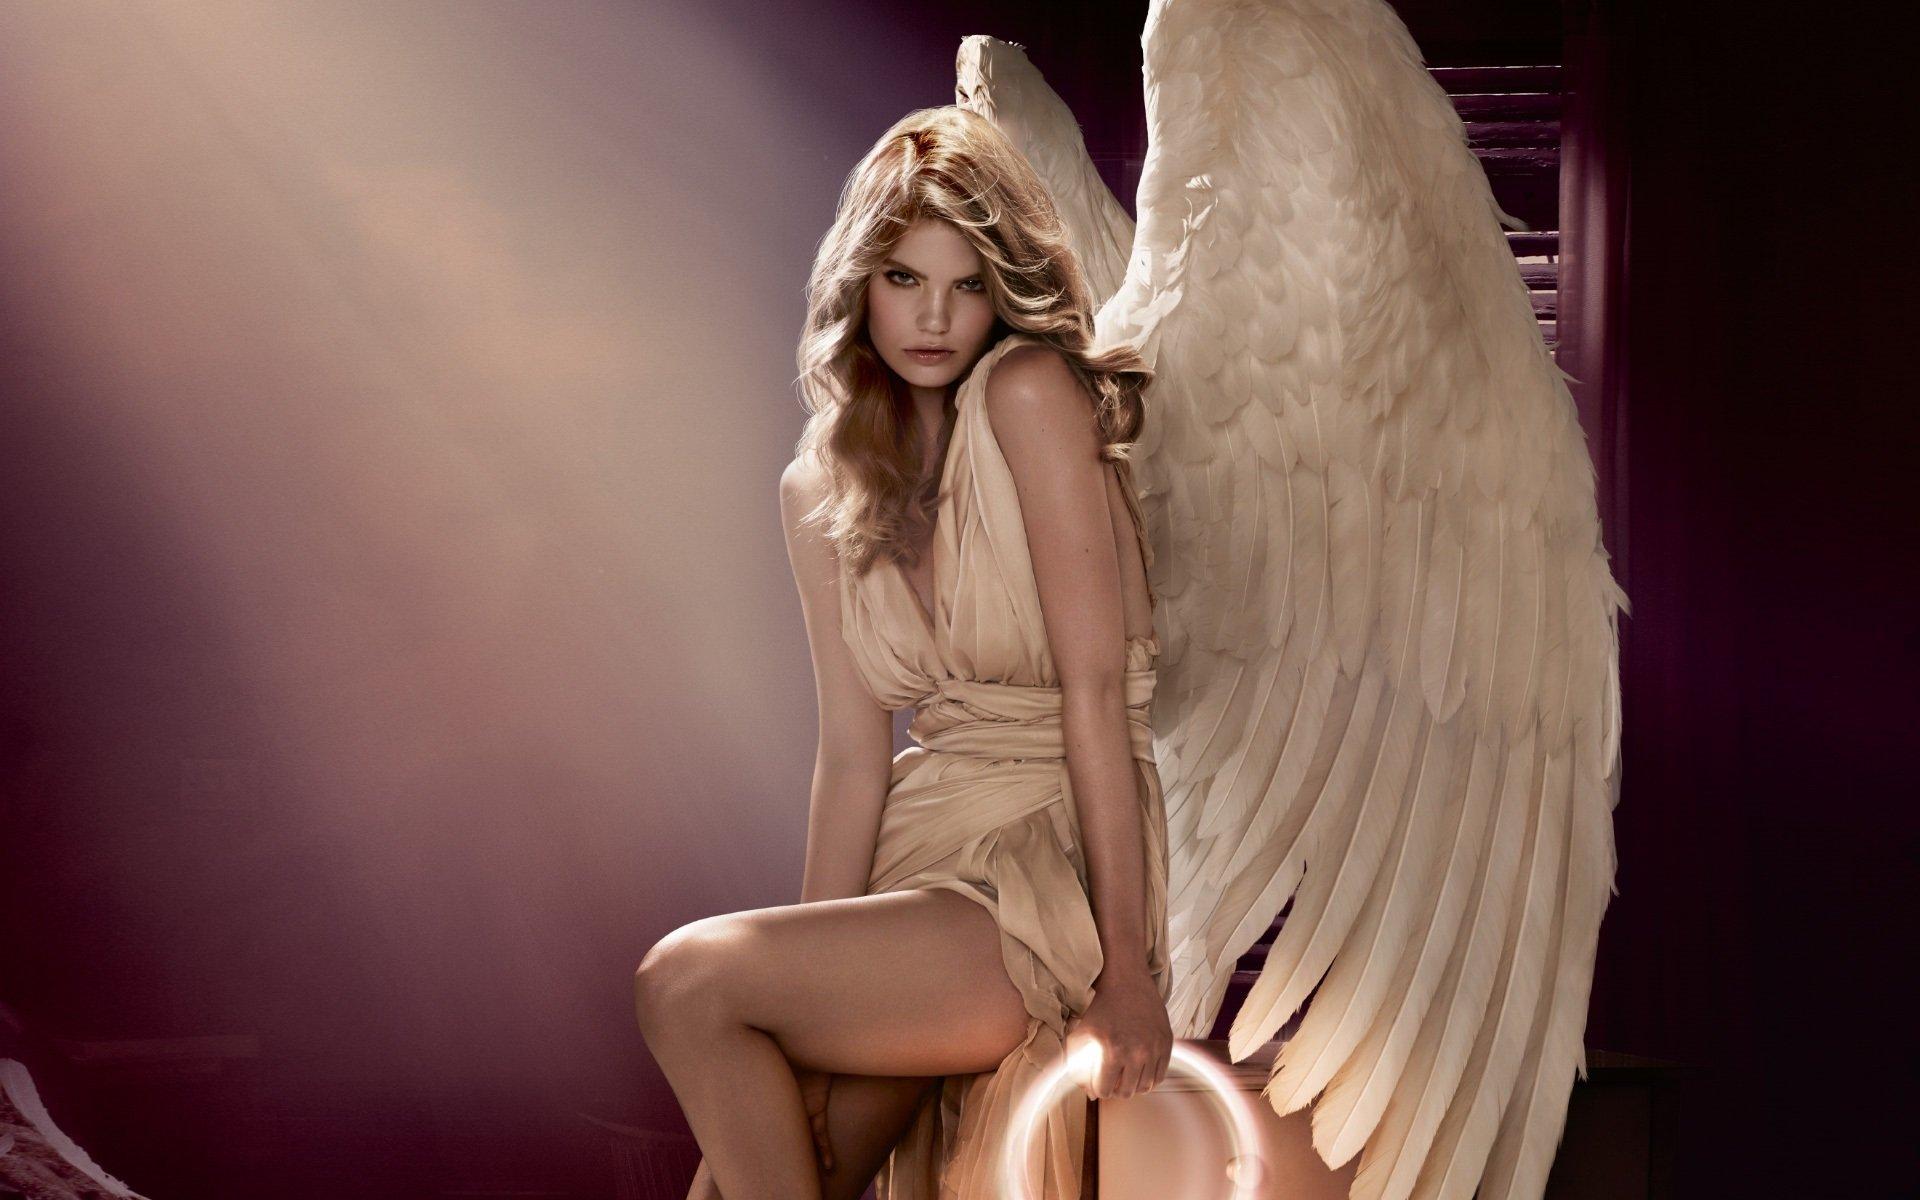 https://w-dog.ru/wallpapers/4/2/426421434909041/devushka-angel-angel-krylya-belye-perya-poza-nimb-ruka-svet.jpg